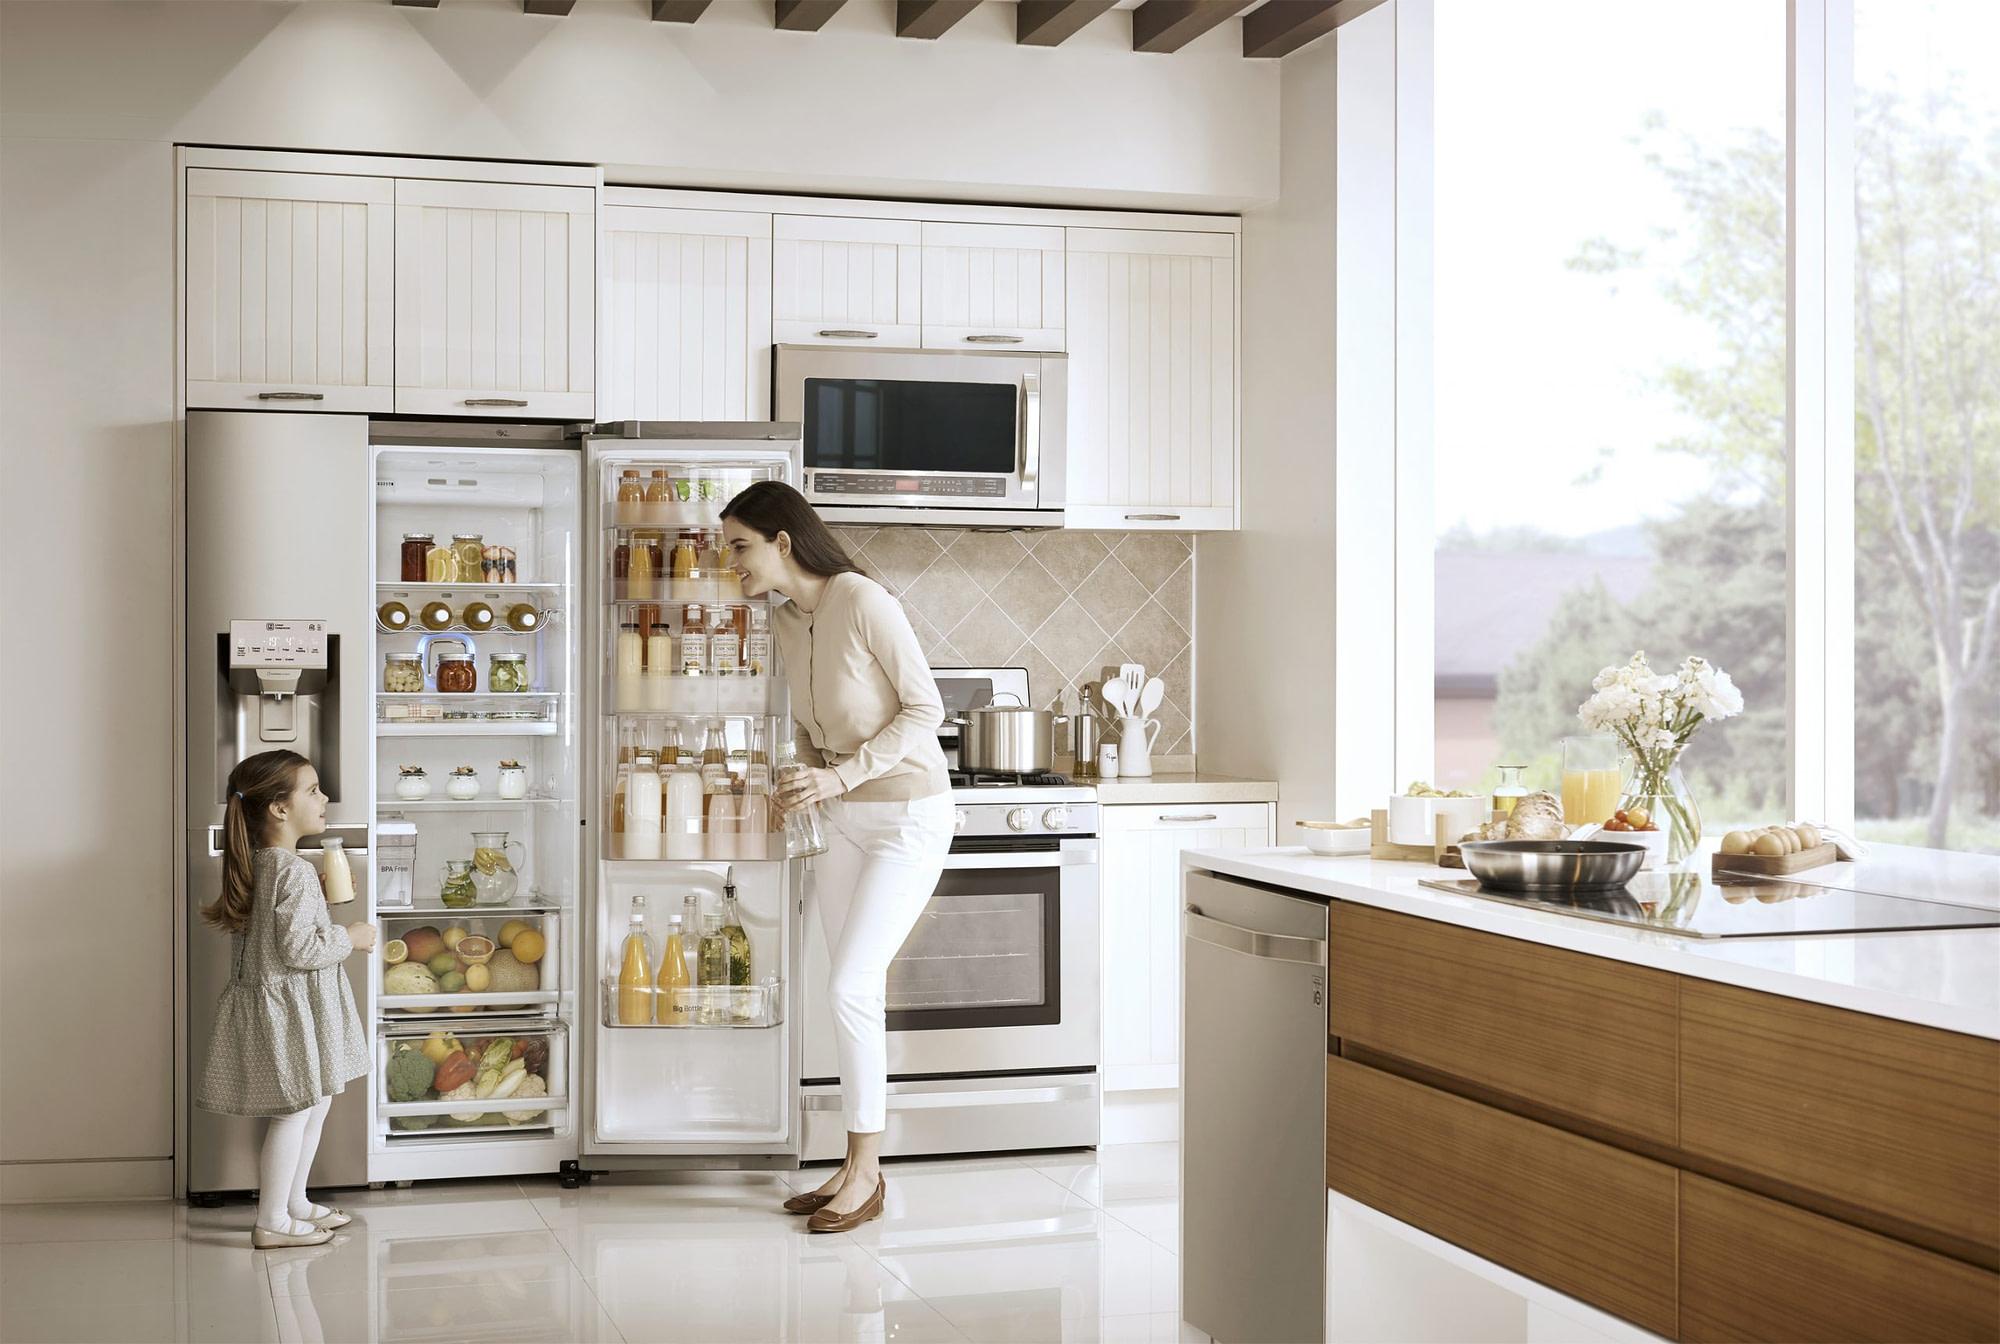 How to Design Your Kitchen Around an American Style Fridge Freezer ...